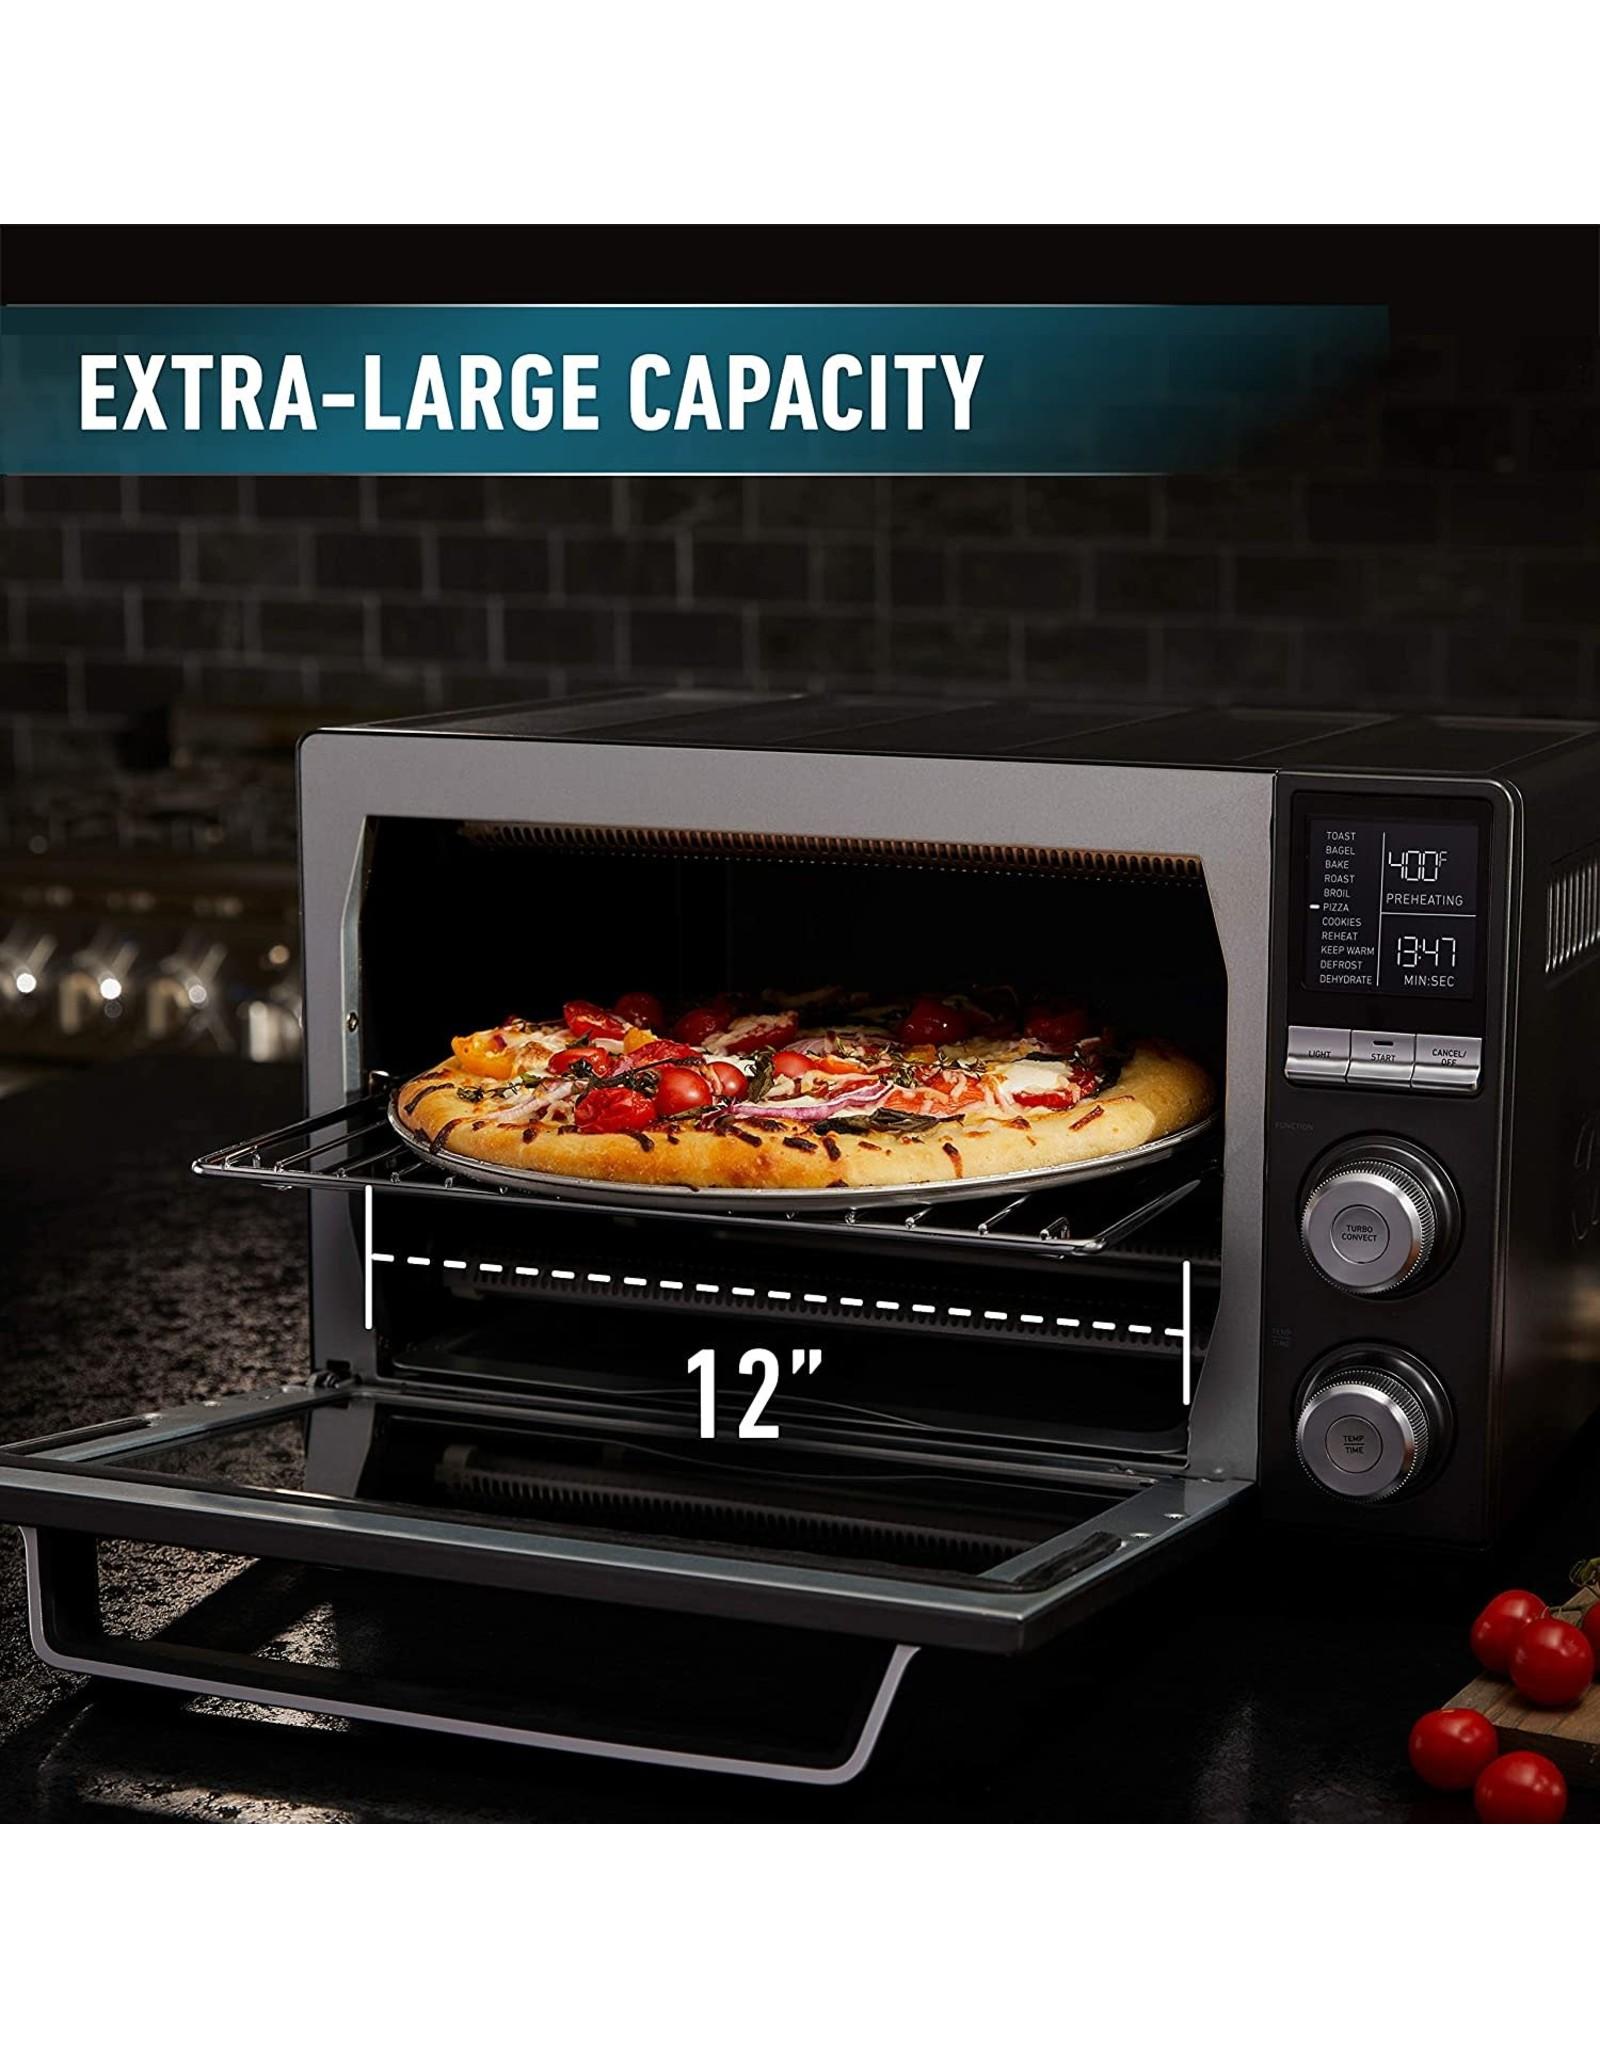 Calphalon Calphalon Quartz Heat Countertop Toaster Oven, Stainless Steel, Extra-Large Capacity, Black, Dark Gray